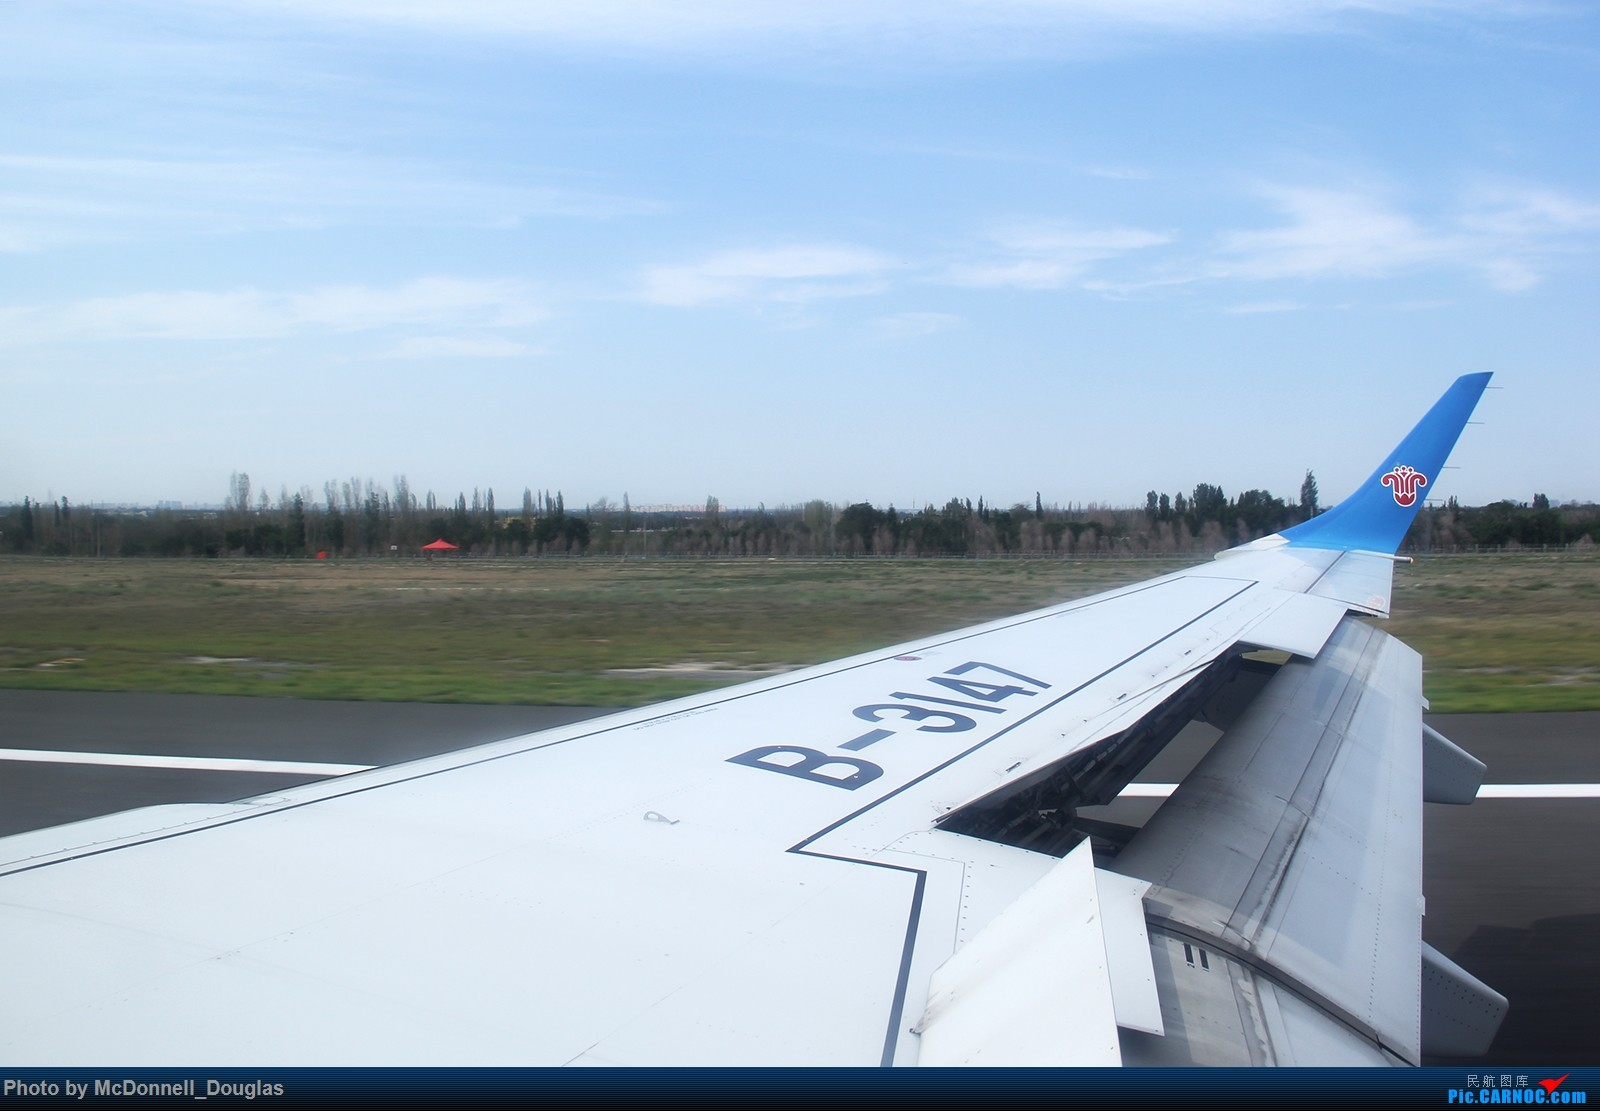 Re:[原创]【上海飞友会】【zc带你走天下(3)】再访祖辈年轻时工作的土地,父母年少时生活戈壁,跨越大半个中国去看新疆,回程小游蓉城(下) EMBRAER ERJ-190LR B-3147